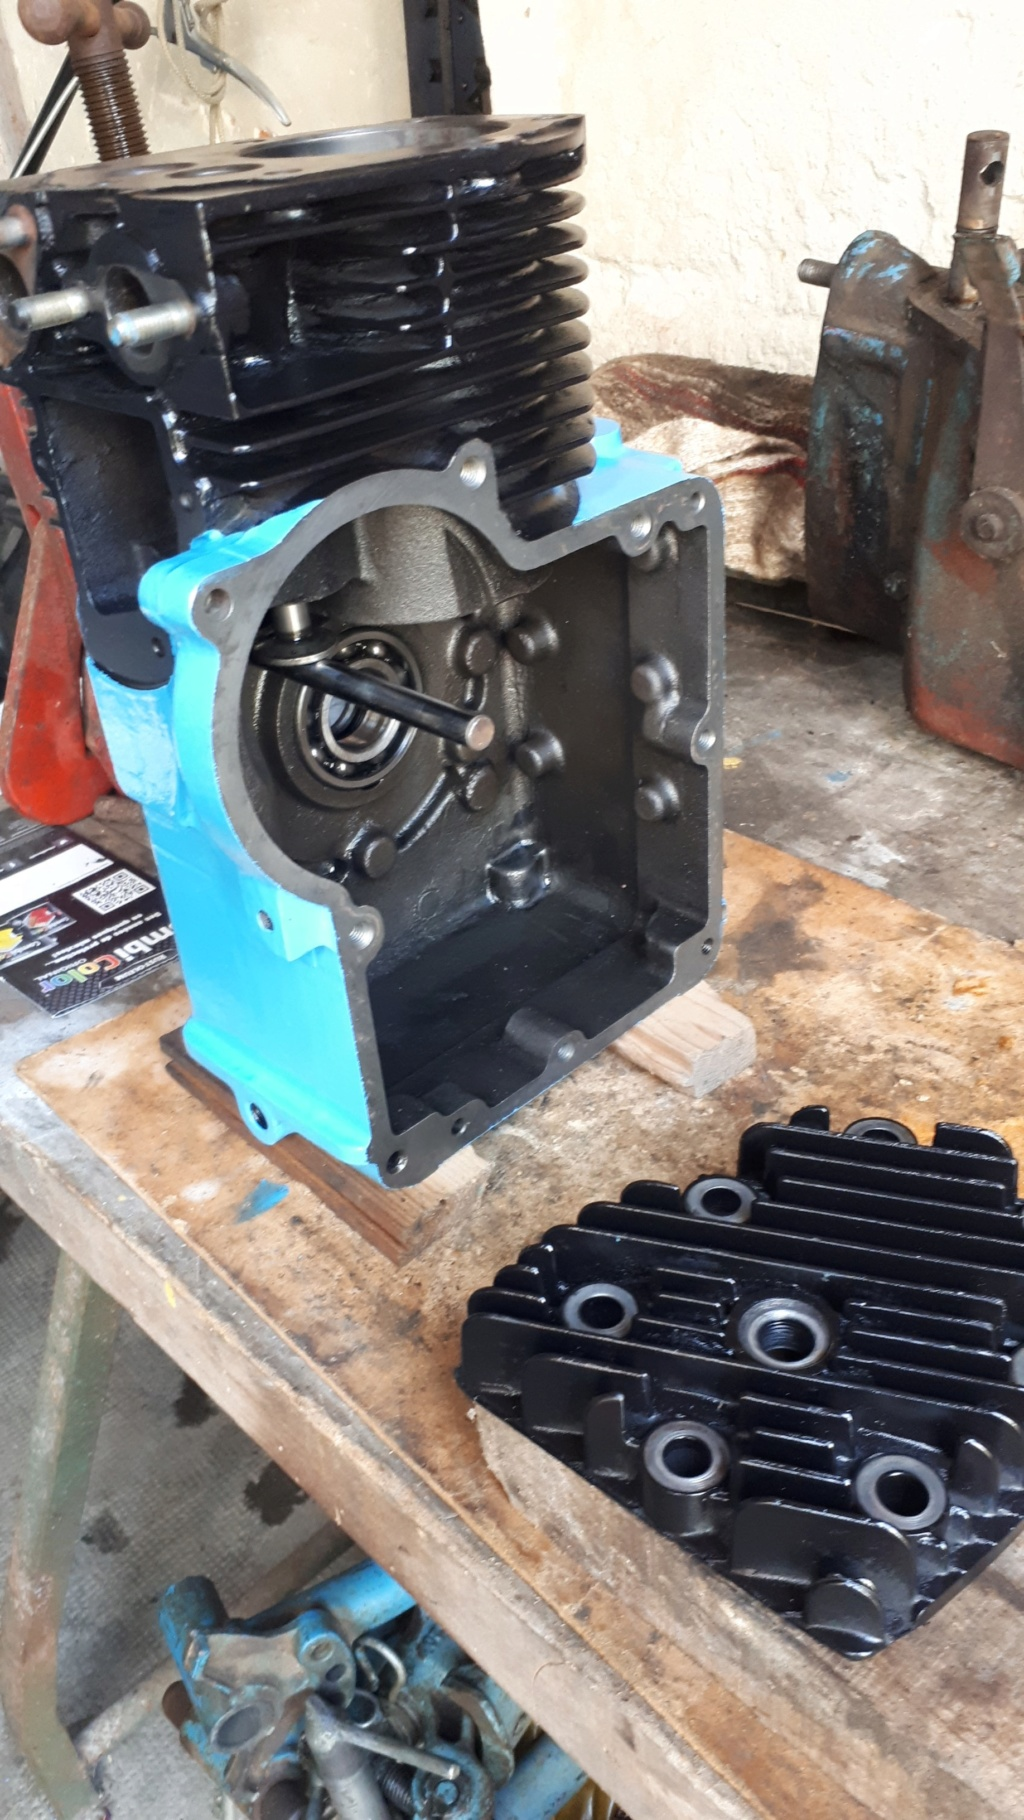 Pp2x - Rénovation Moteur MAG 1029 SRLX (PP2X SM) 20180917